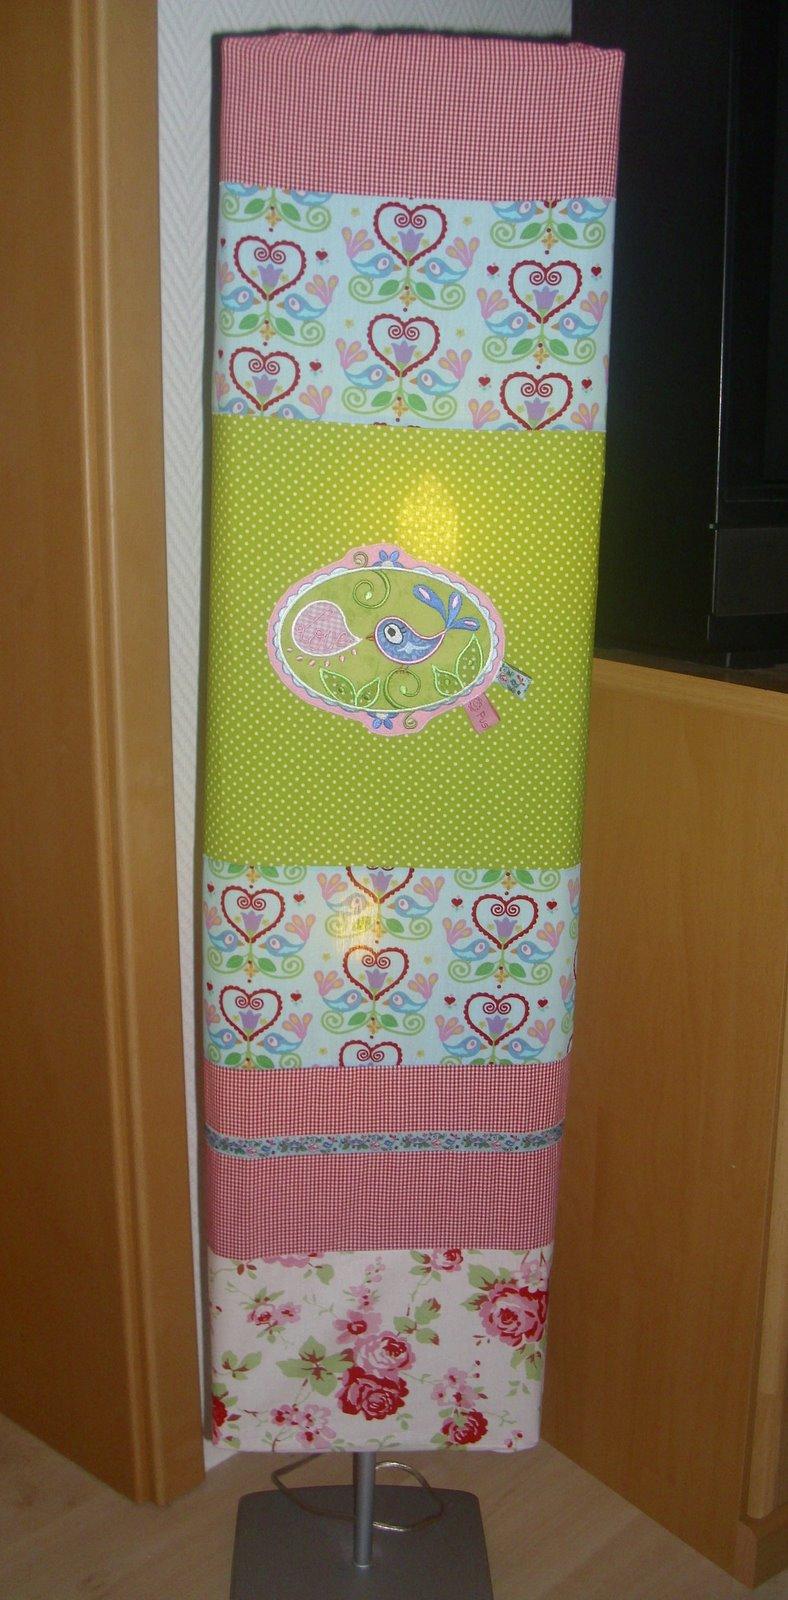 pusteblume ikea lampe meets lovechirp und rosa. Black Bedroom Furniture Sets. Home Design Ideas